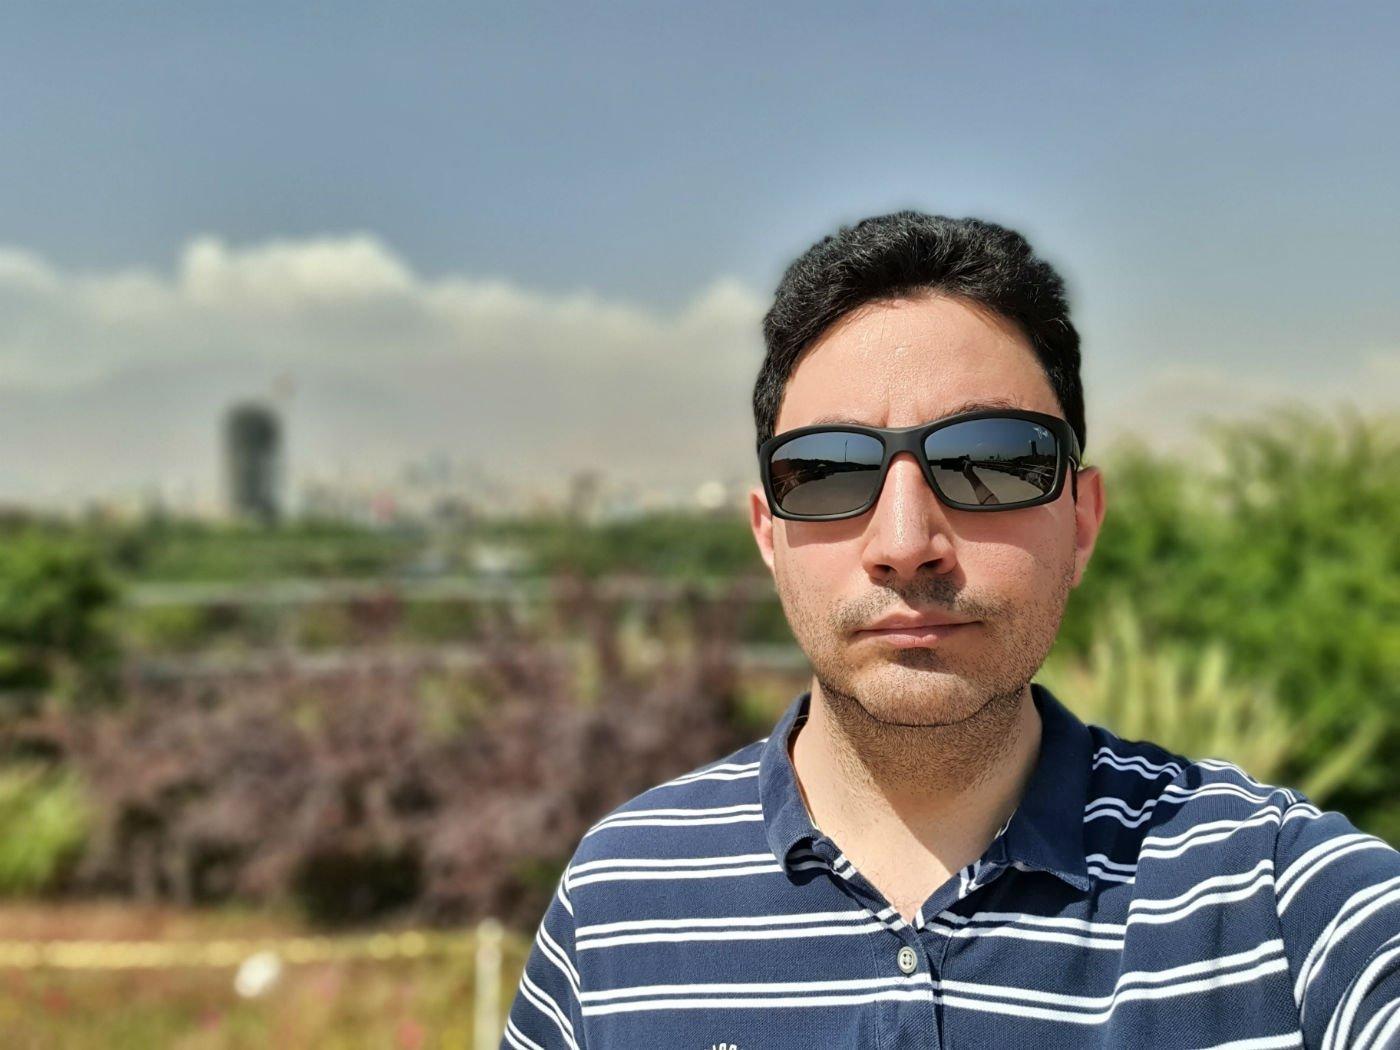 GalaxyNote10Lite Selfie 8 w1400 بررسی سامسونگ گلکسی نوت ۱۰ لایت؛ اولین عضو میانرده از خانواده نوت اخبار IT